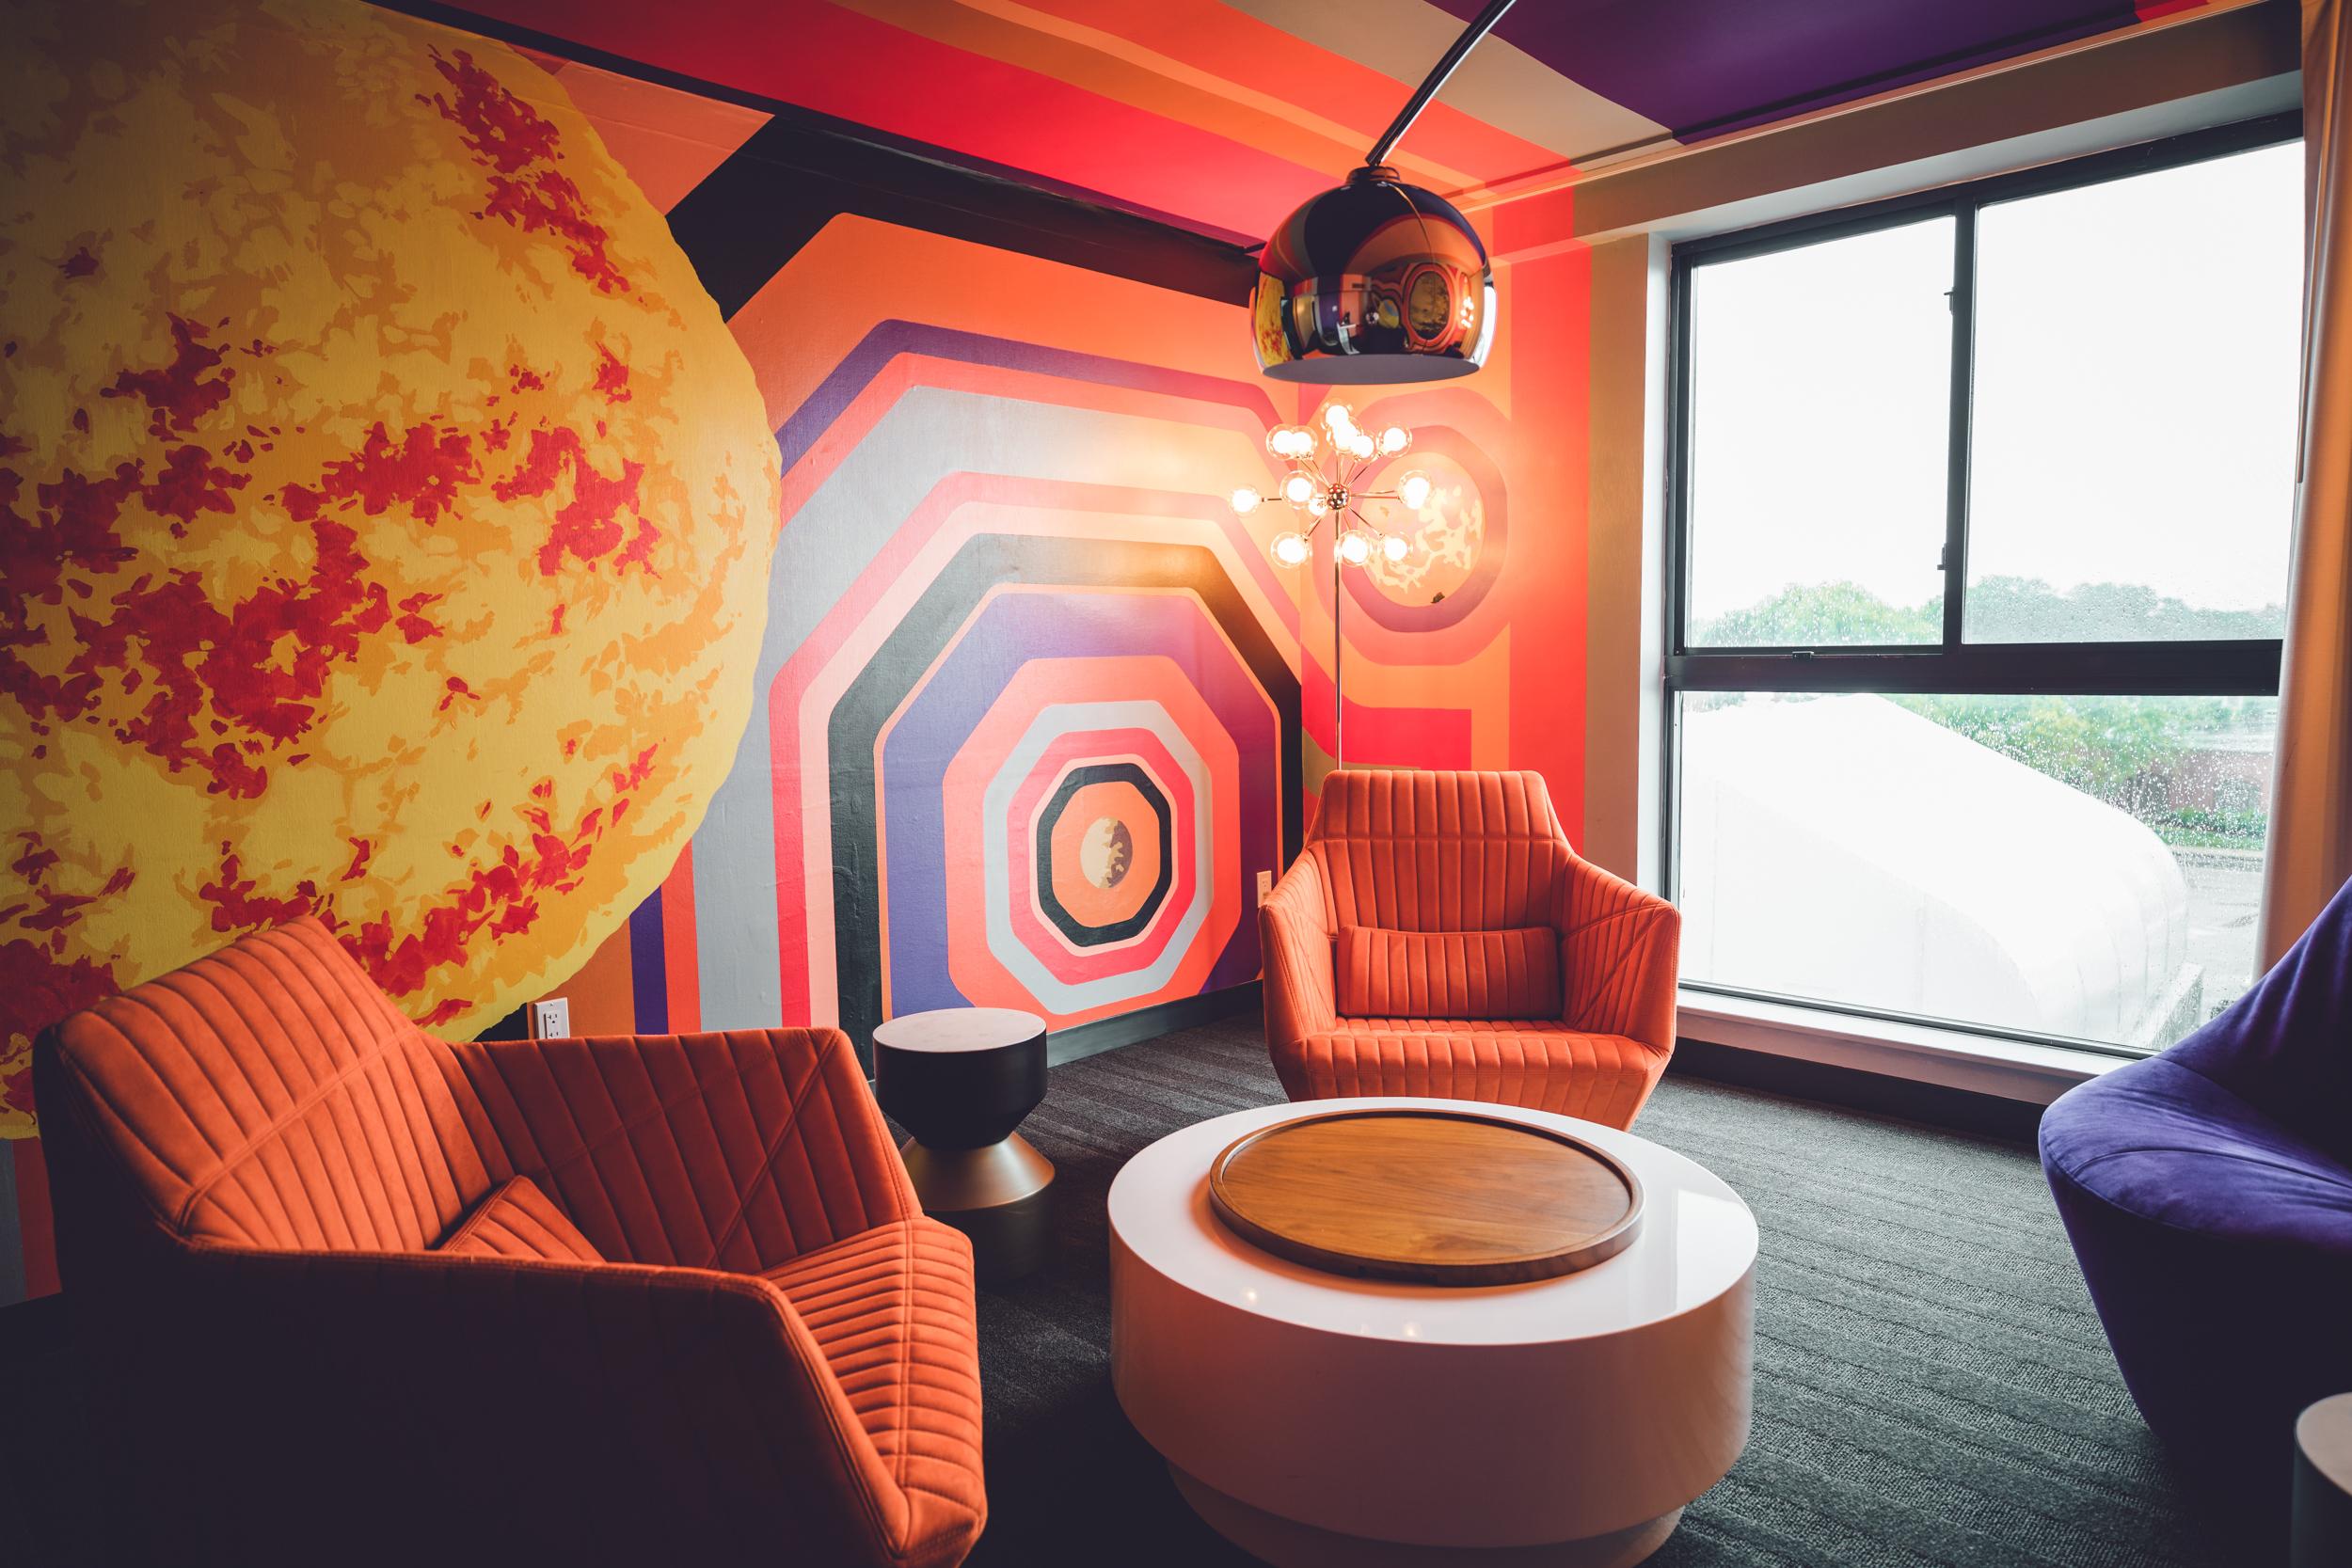 Rachel Off Duty: Hotel Studio Allston Boston - Hotel Review